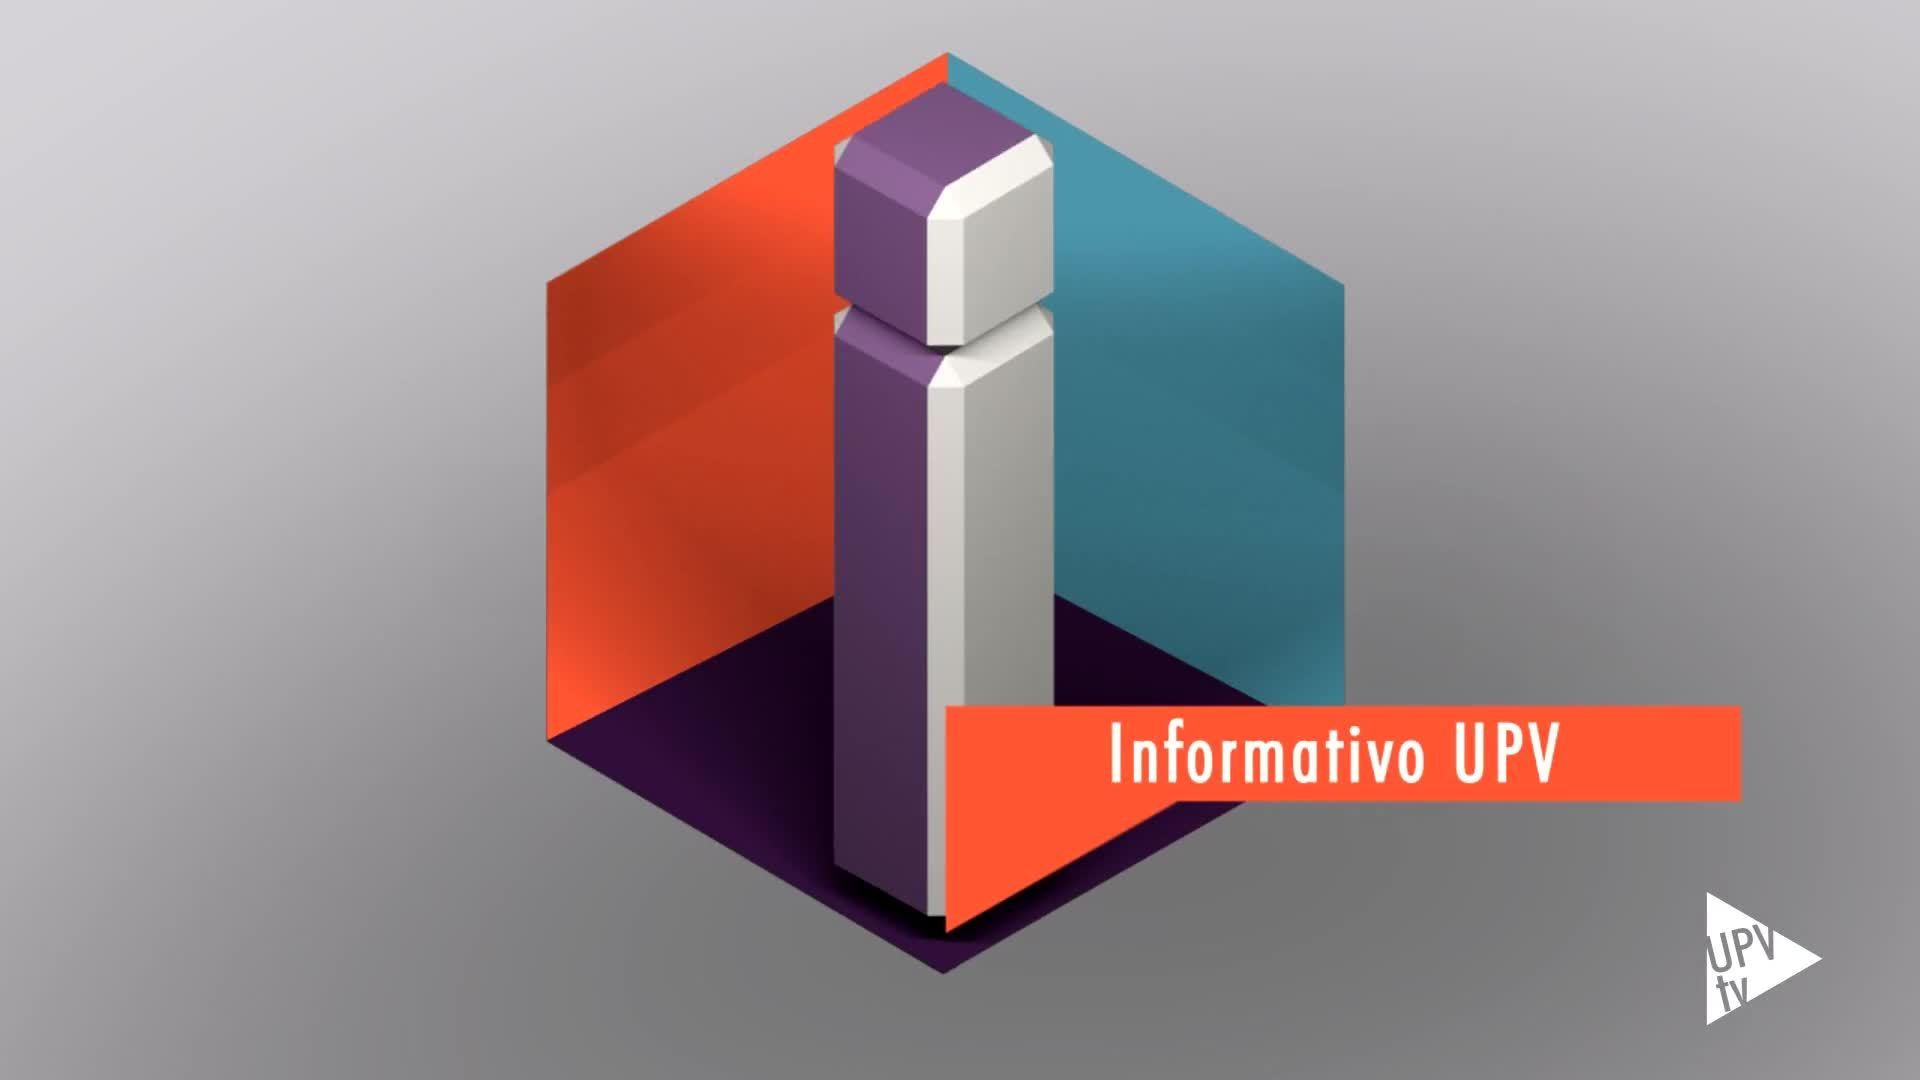 10-02-2016 Informativo UPV